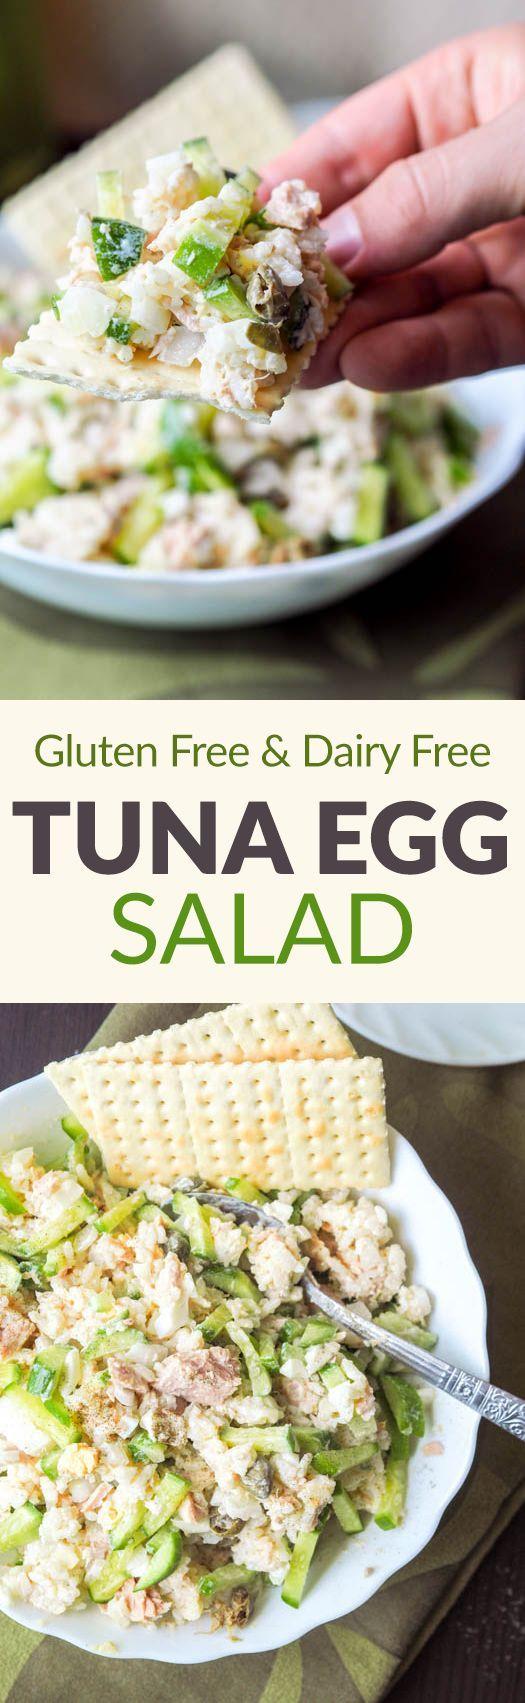 25 best ideas about tuna egg salad on pinterest tuna for Tuna fish salad calories